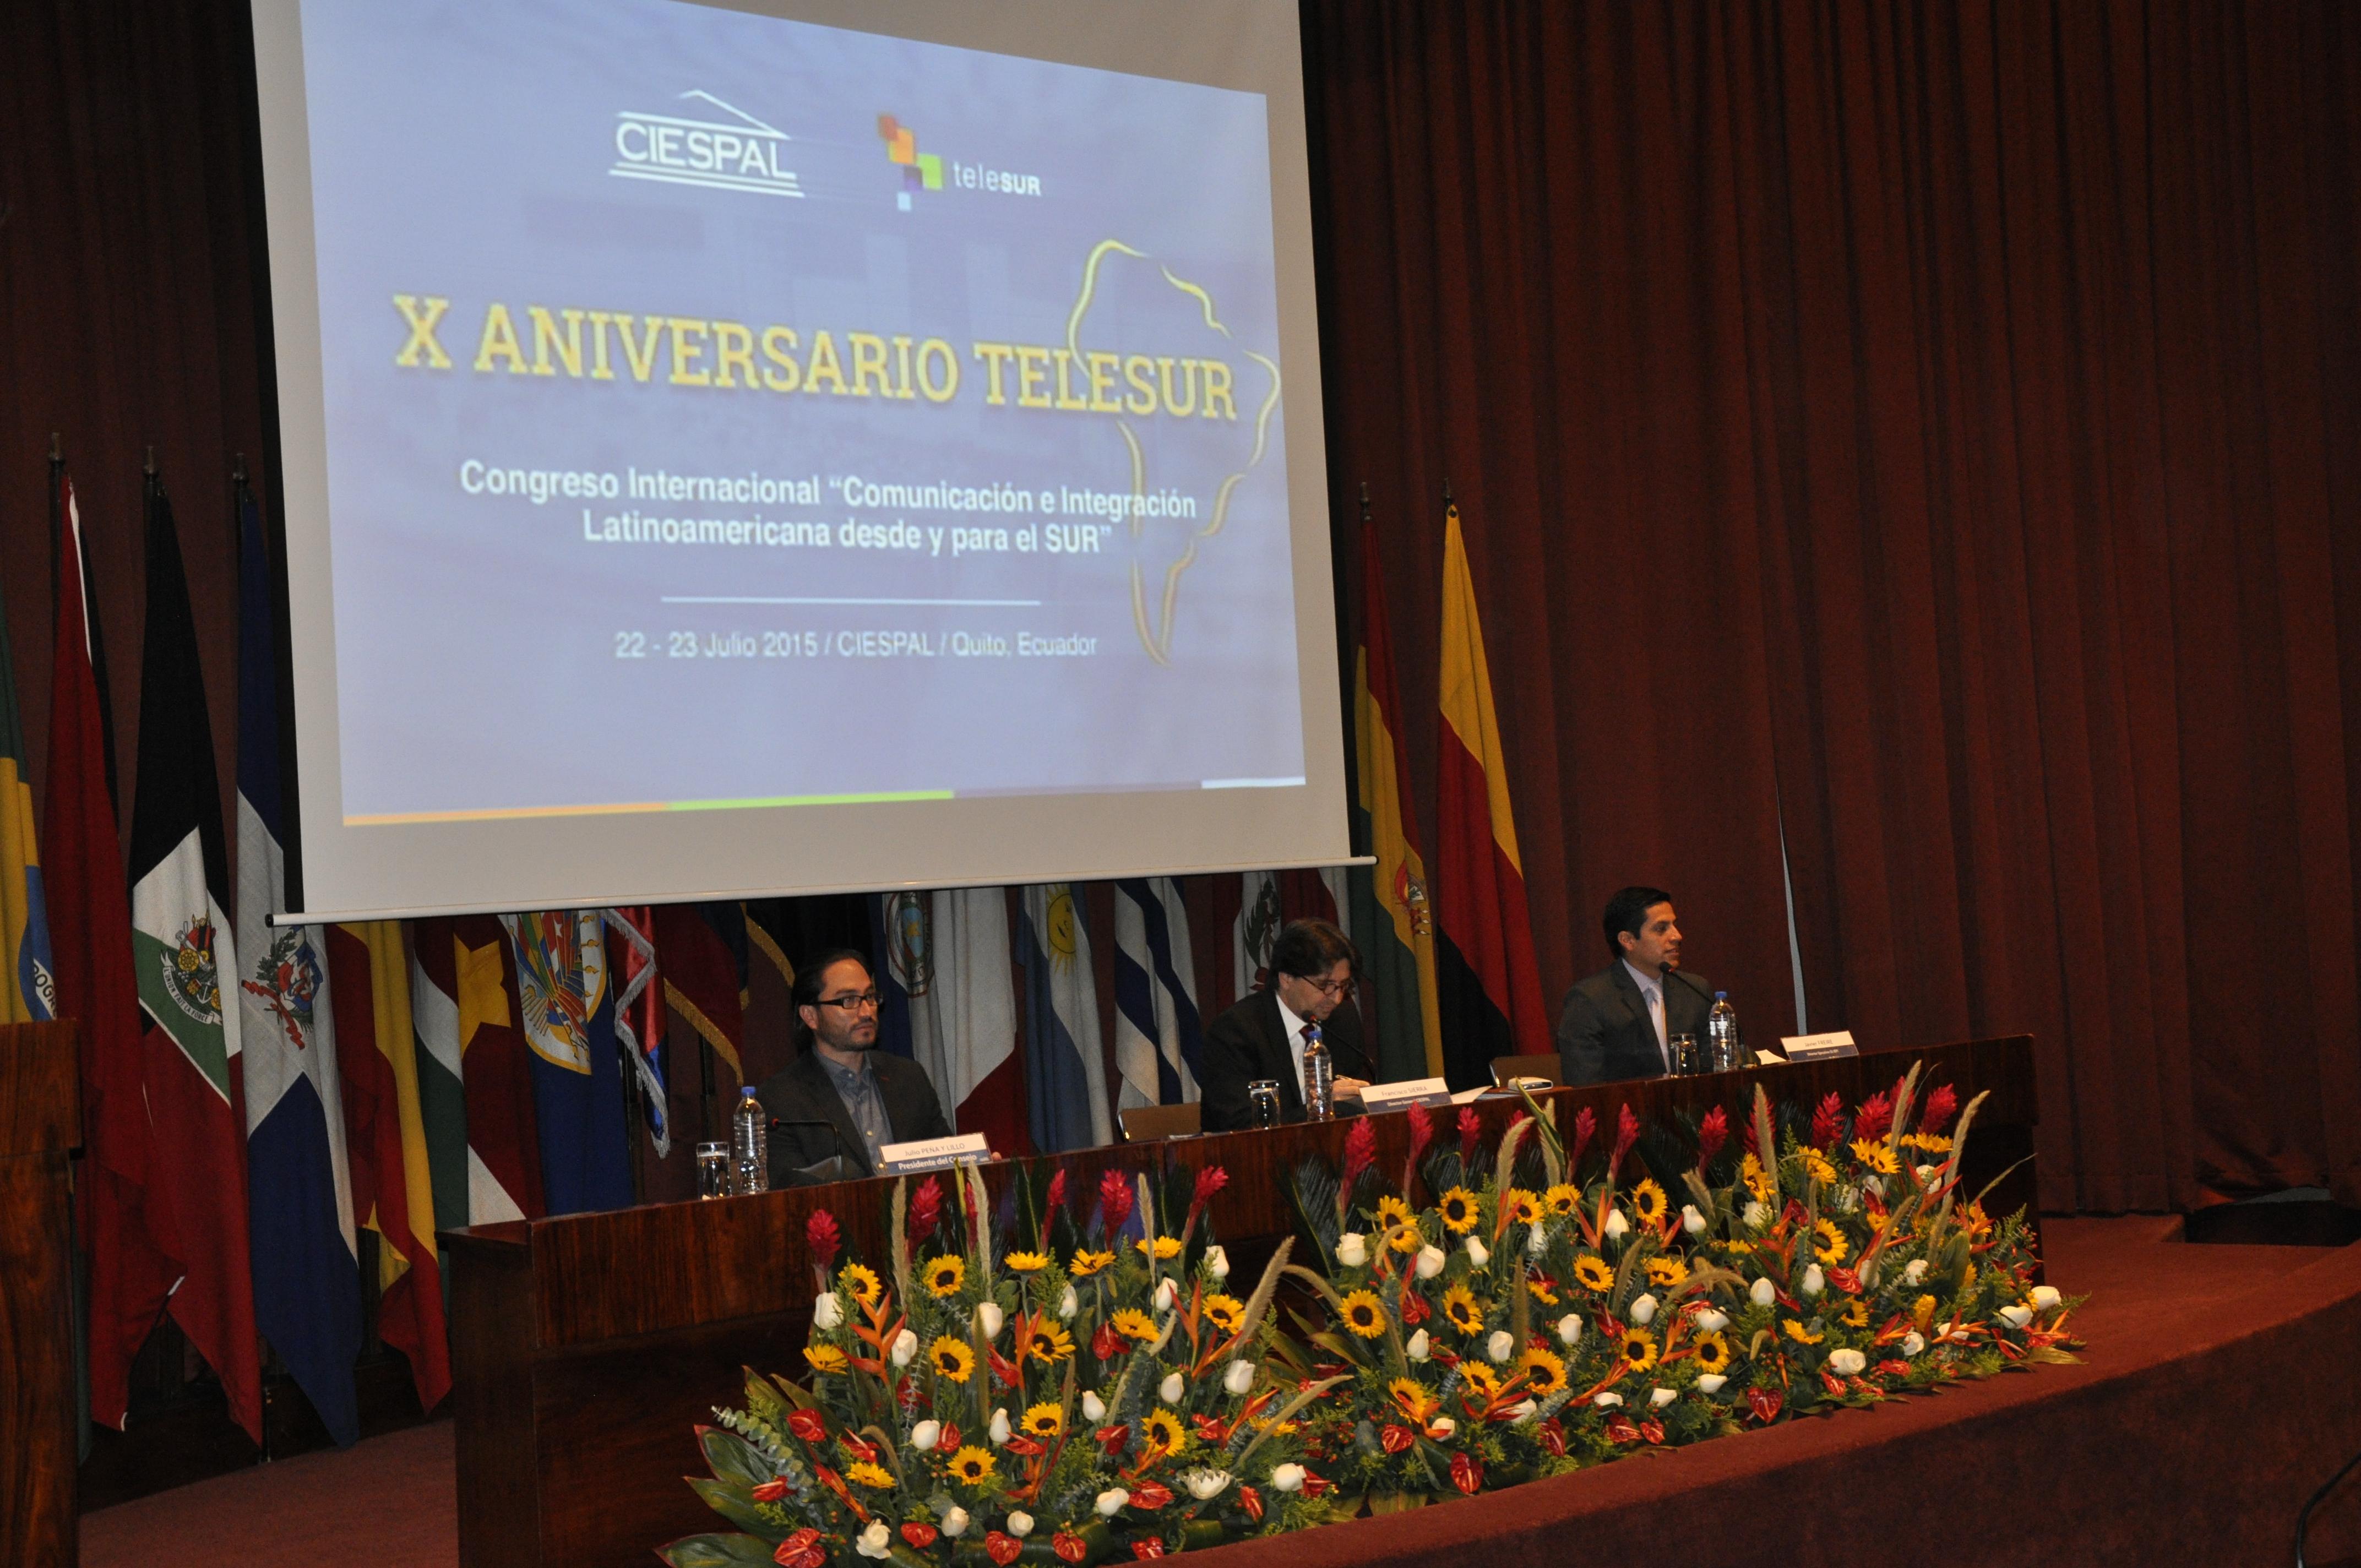 Inauguración de Congreso Internacional  por Aniversario de TeleSur